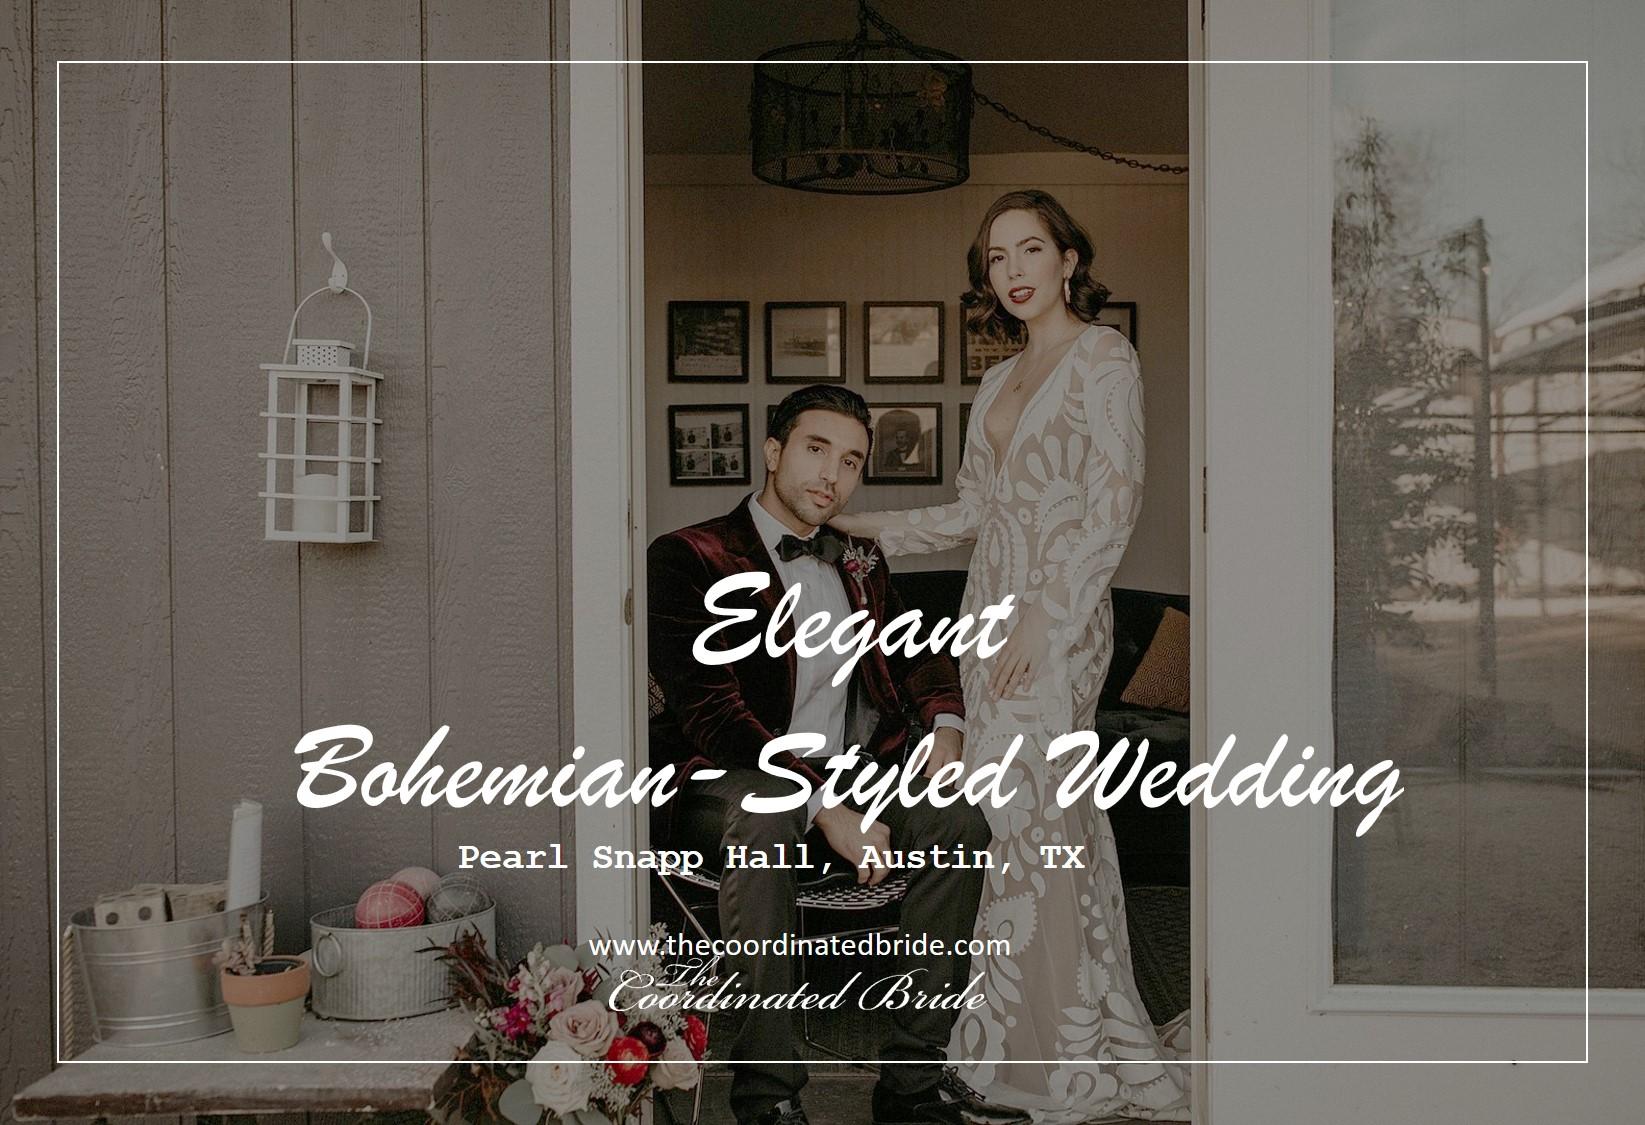 An Elegant Bohemian Texas Wedding at Pearl Snap Hall